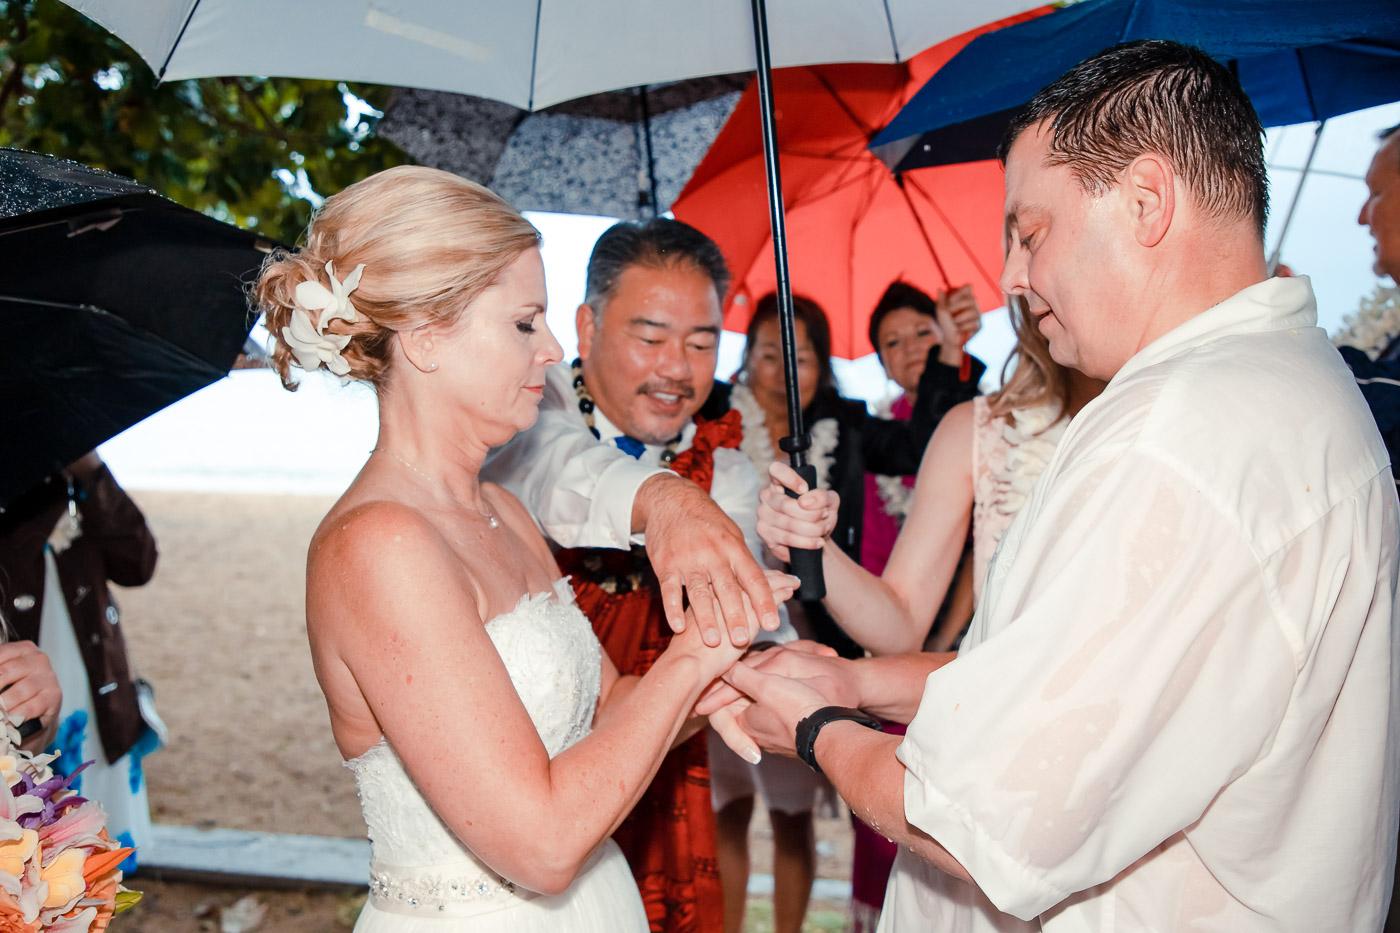 wedding-redux-41036.jpg